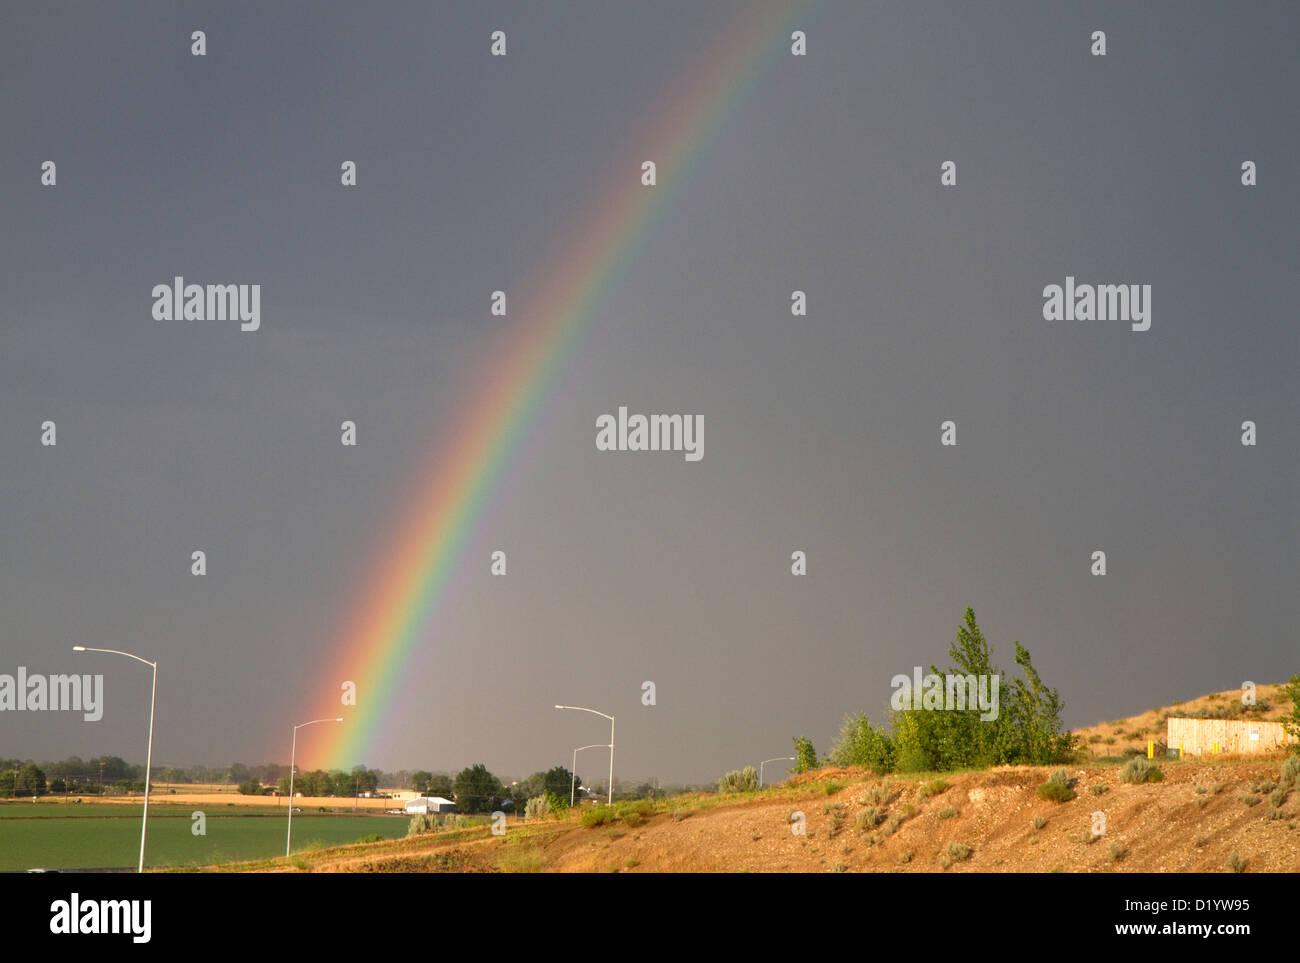 Rainbow over Ada County, Idaho, USA. - Stock Image